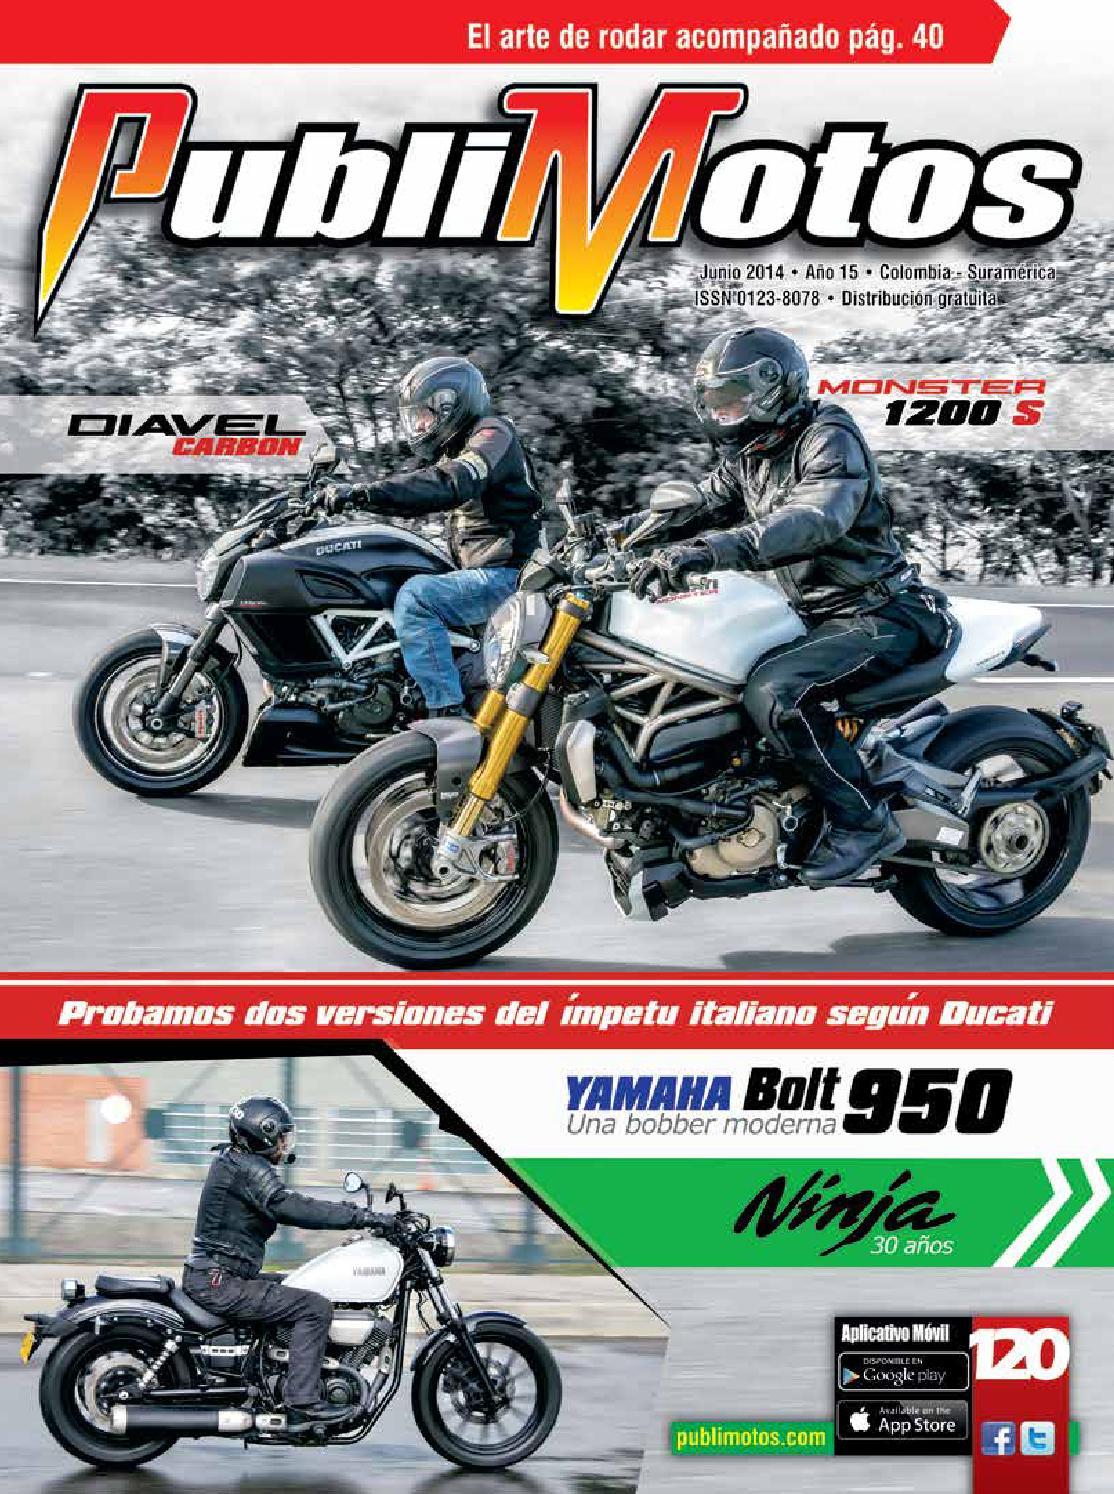 Pm120 by publimotos revista - issuu